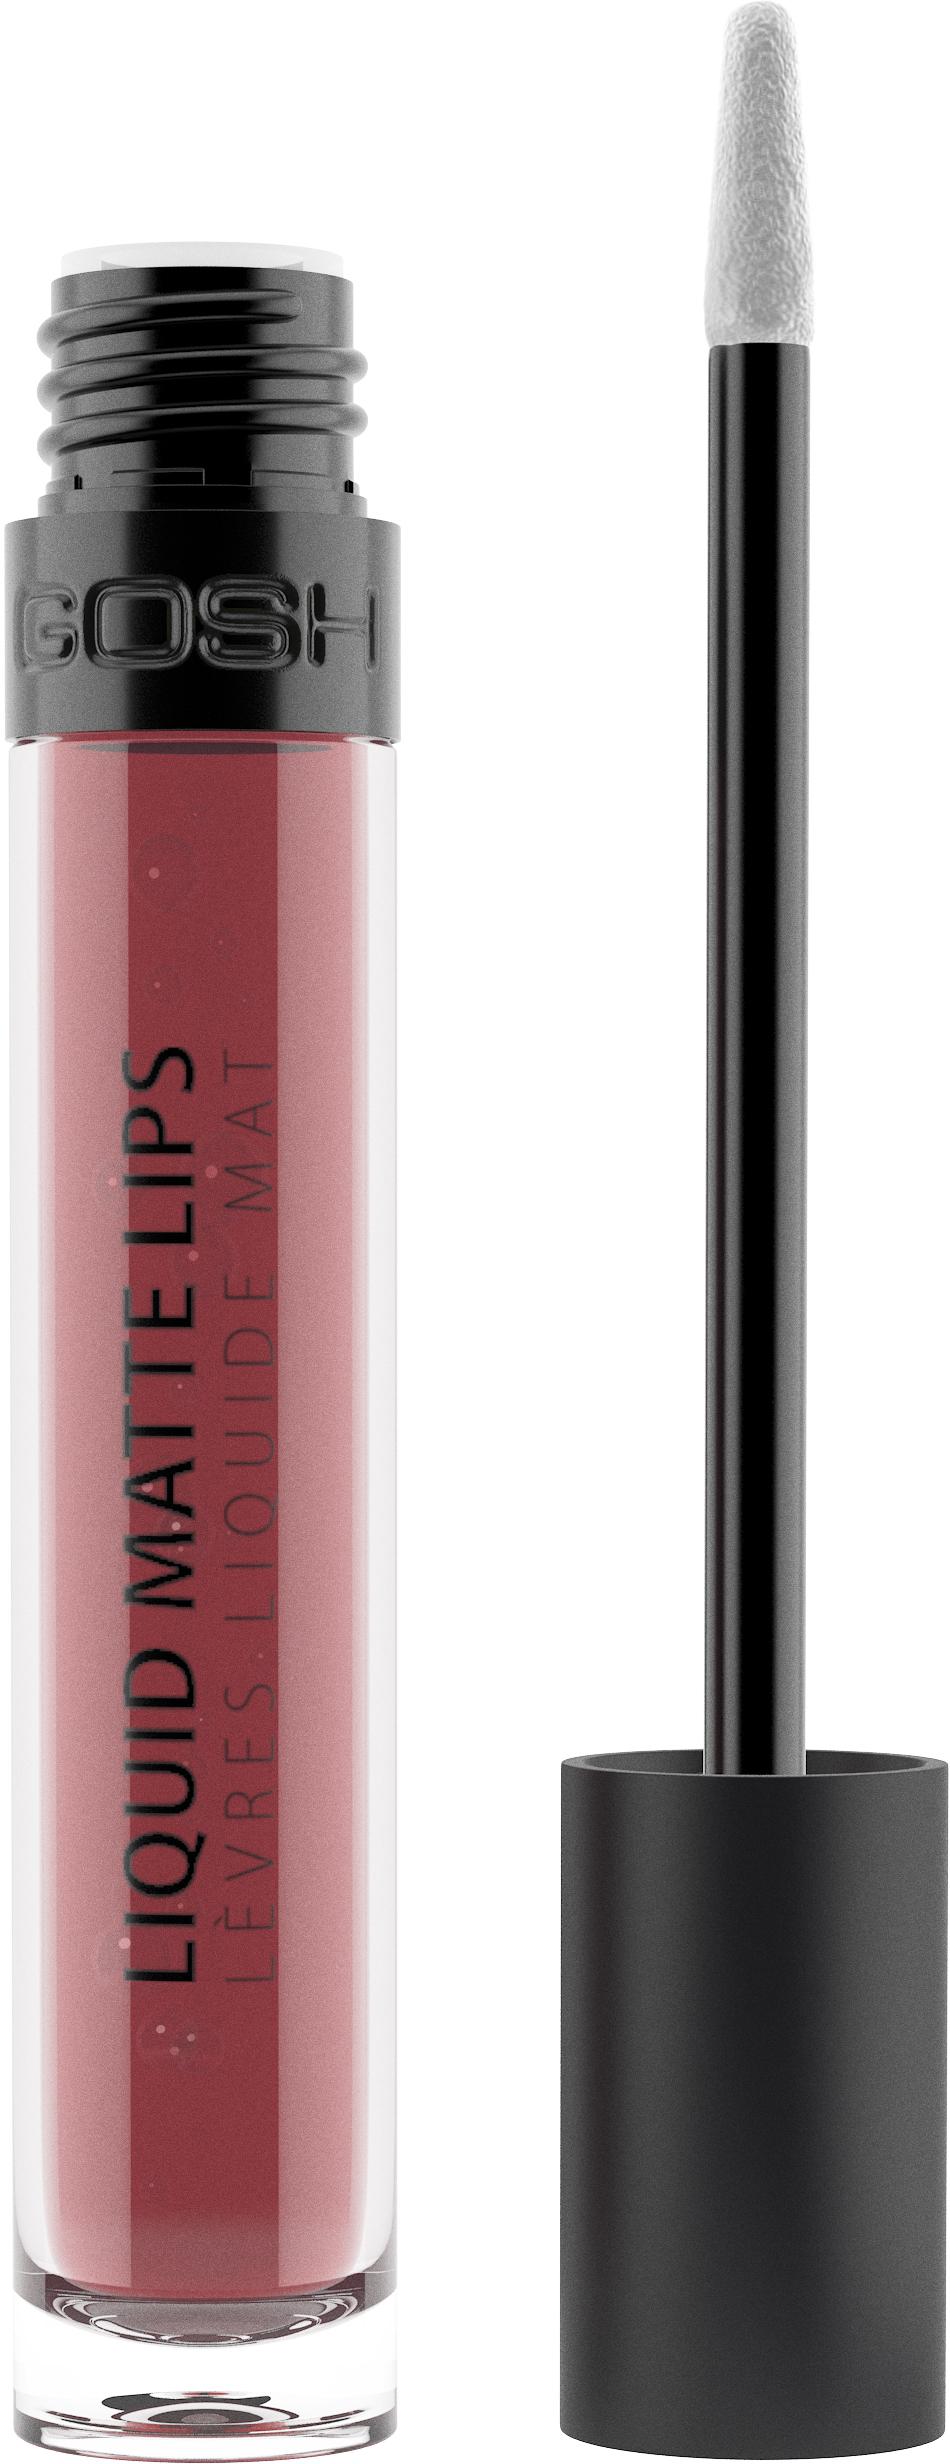 Liquid Matte Lips N03open.jpg